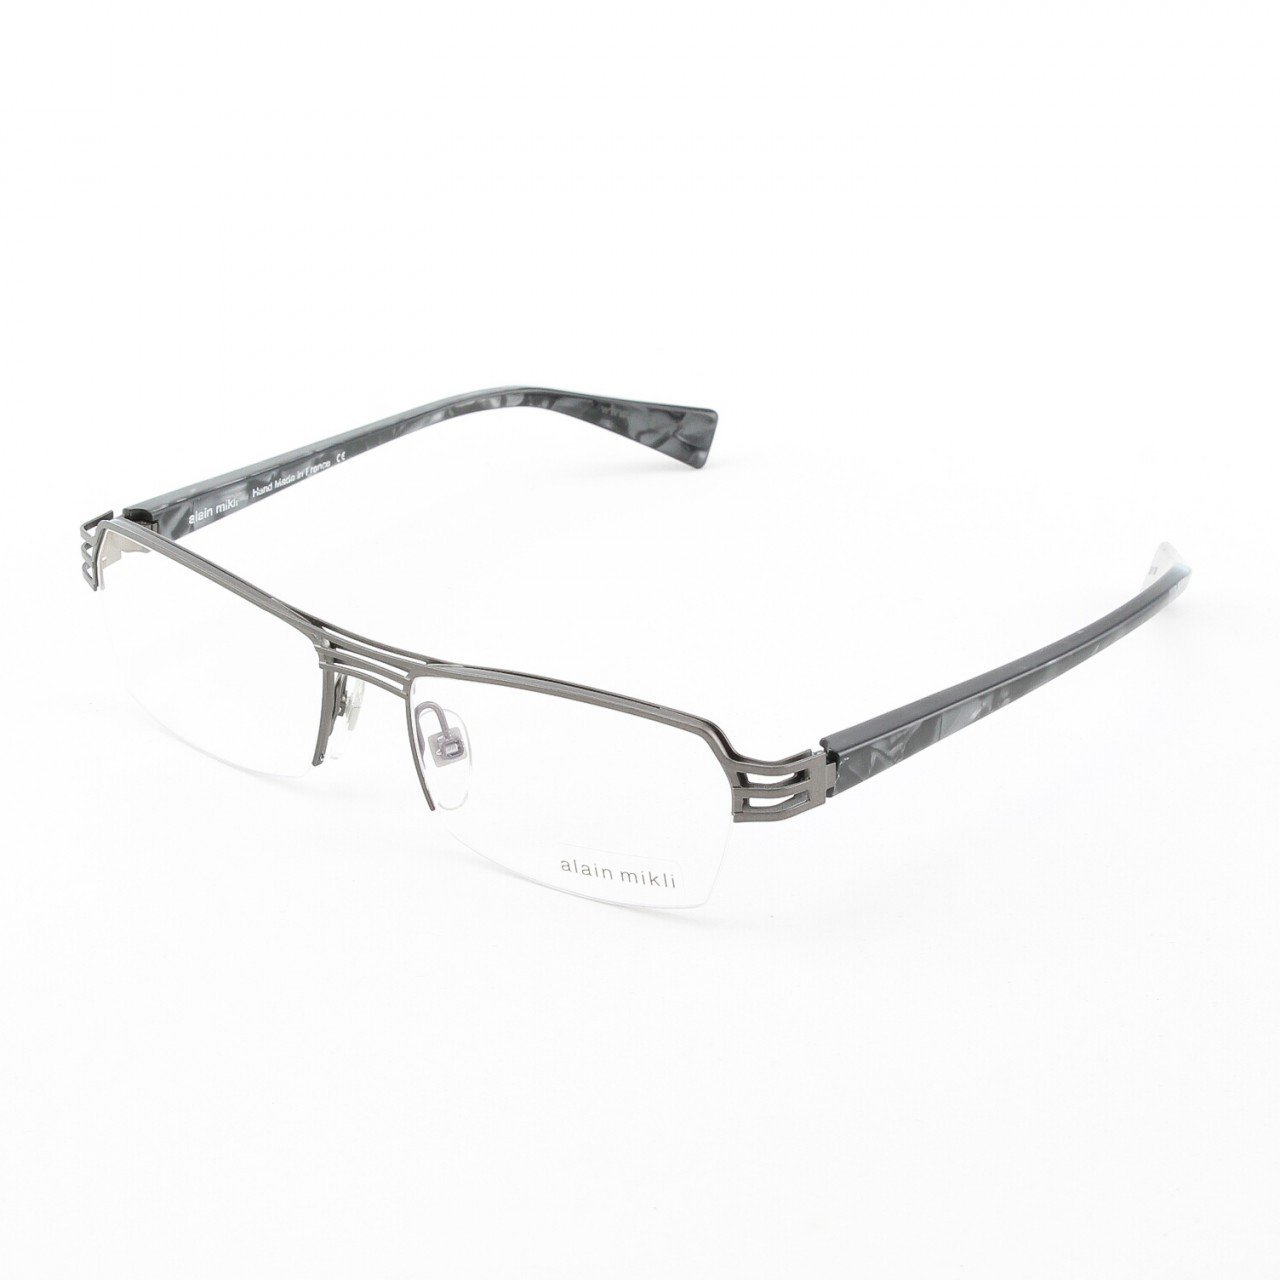 Alain Mikli Eyeglasses AL1107 Col. M00Z Flat Bronze Metal with Pearlized Black Temples